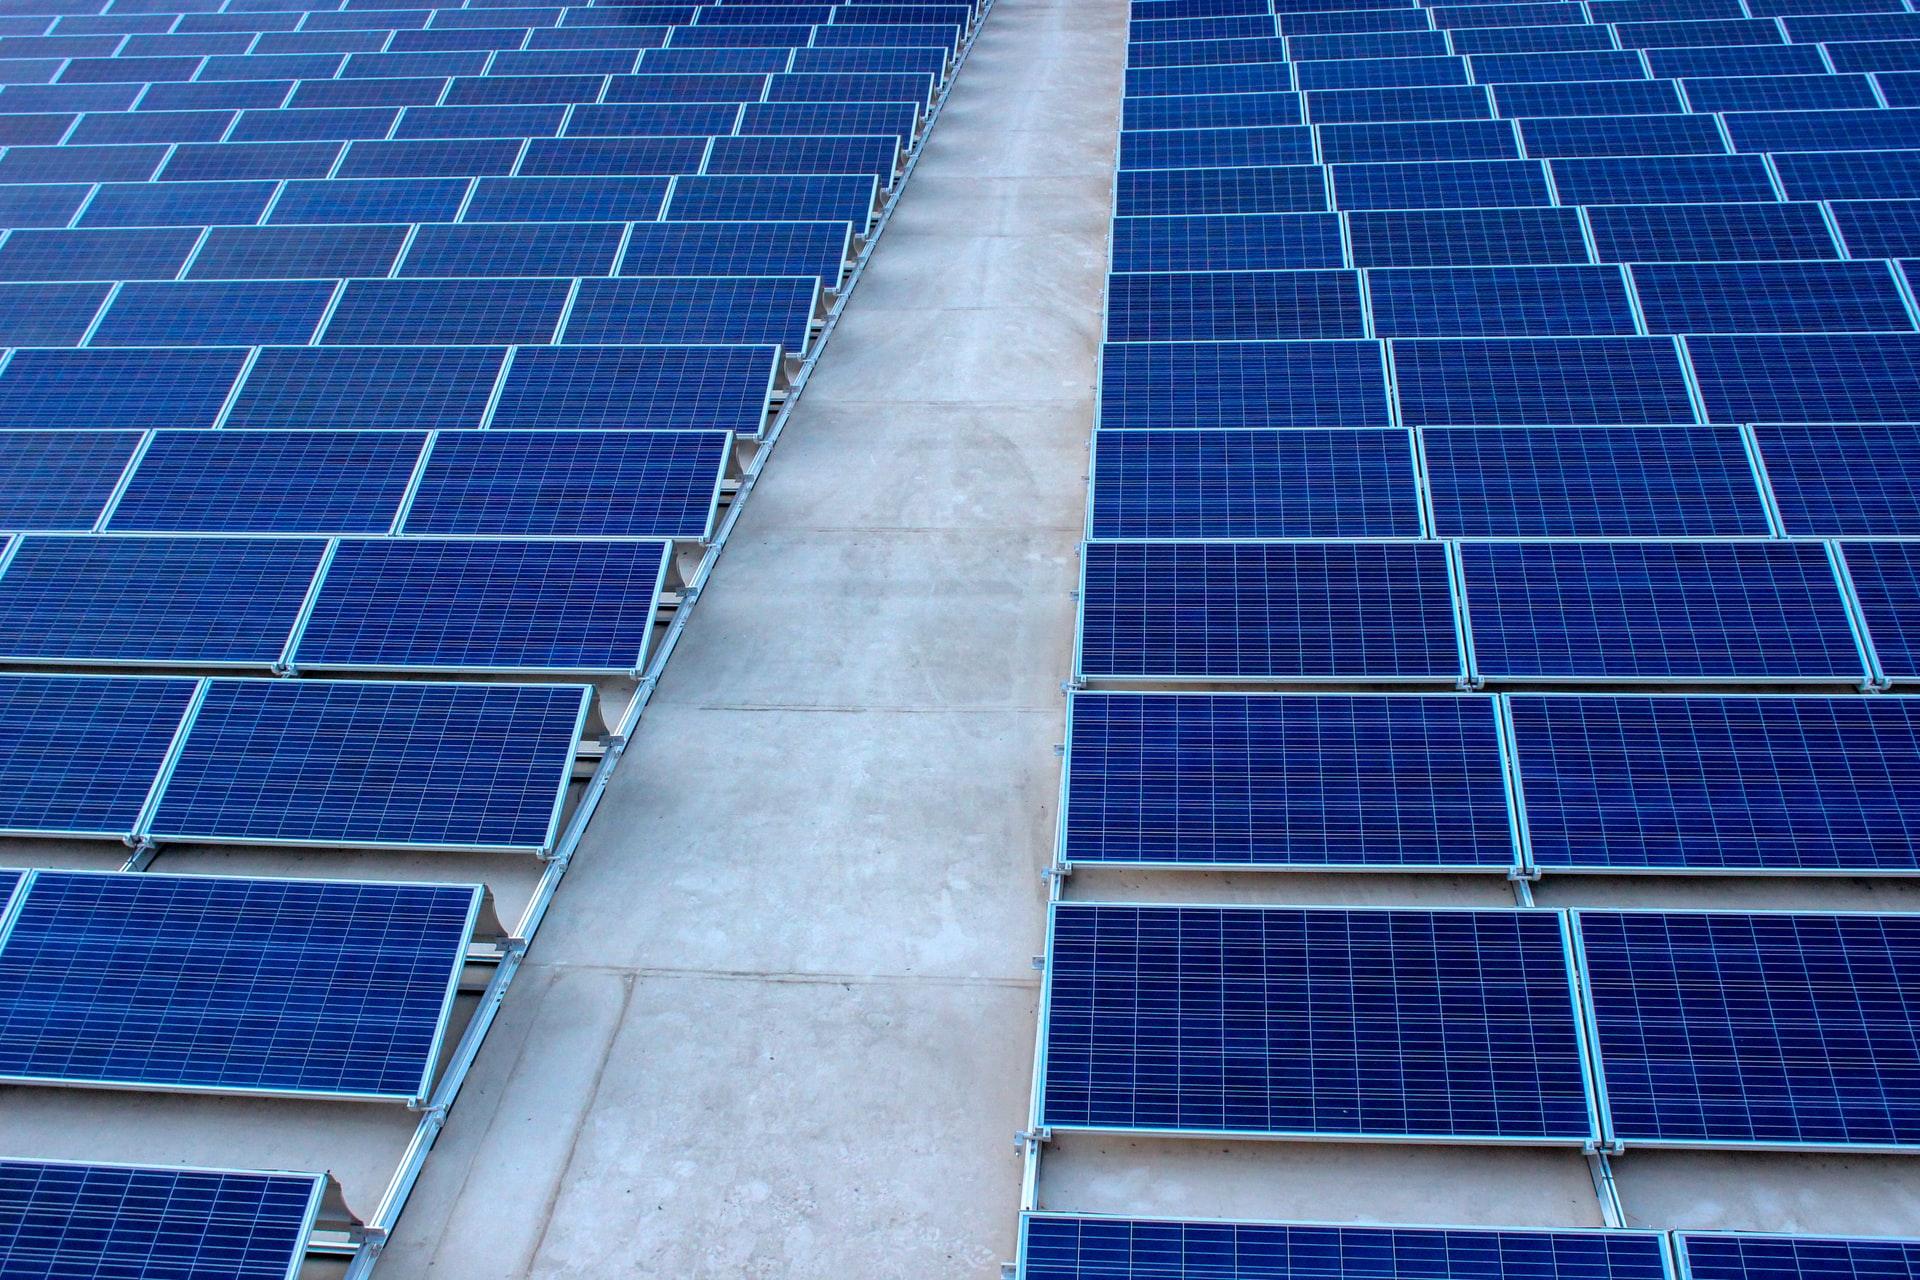 rijen met zonnepanelen